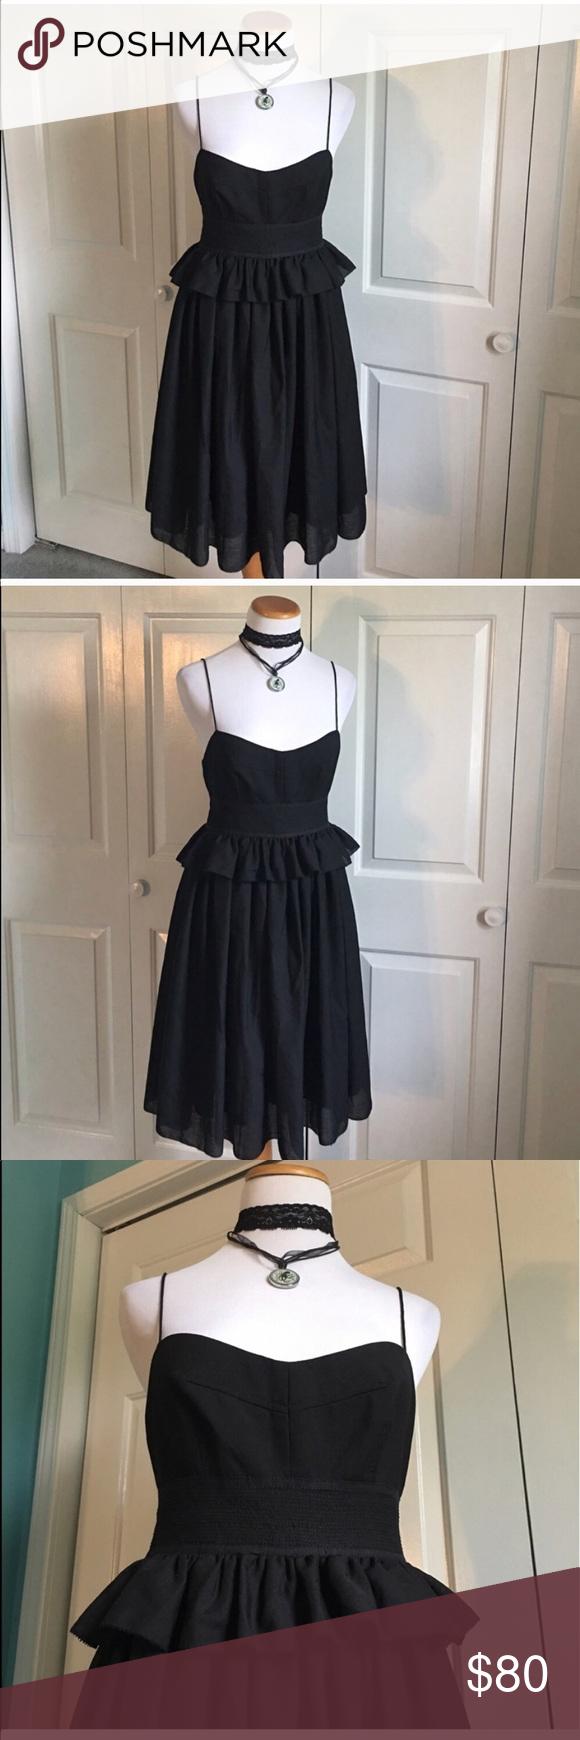 J Crew Block Corset Peplum Dress Midi Length Black Dress With Corset Design And Peplum Waist Size 4 In Excellent Con Peplum Midi Dress Clothes Design Fashion [ 1740 x 580 Pixel ]